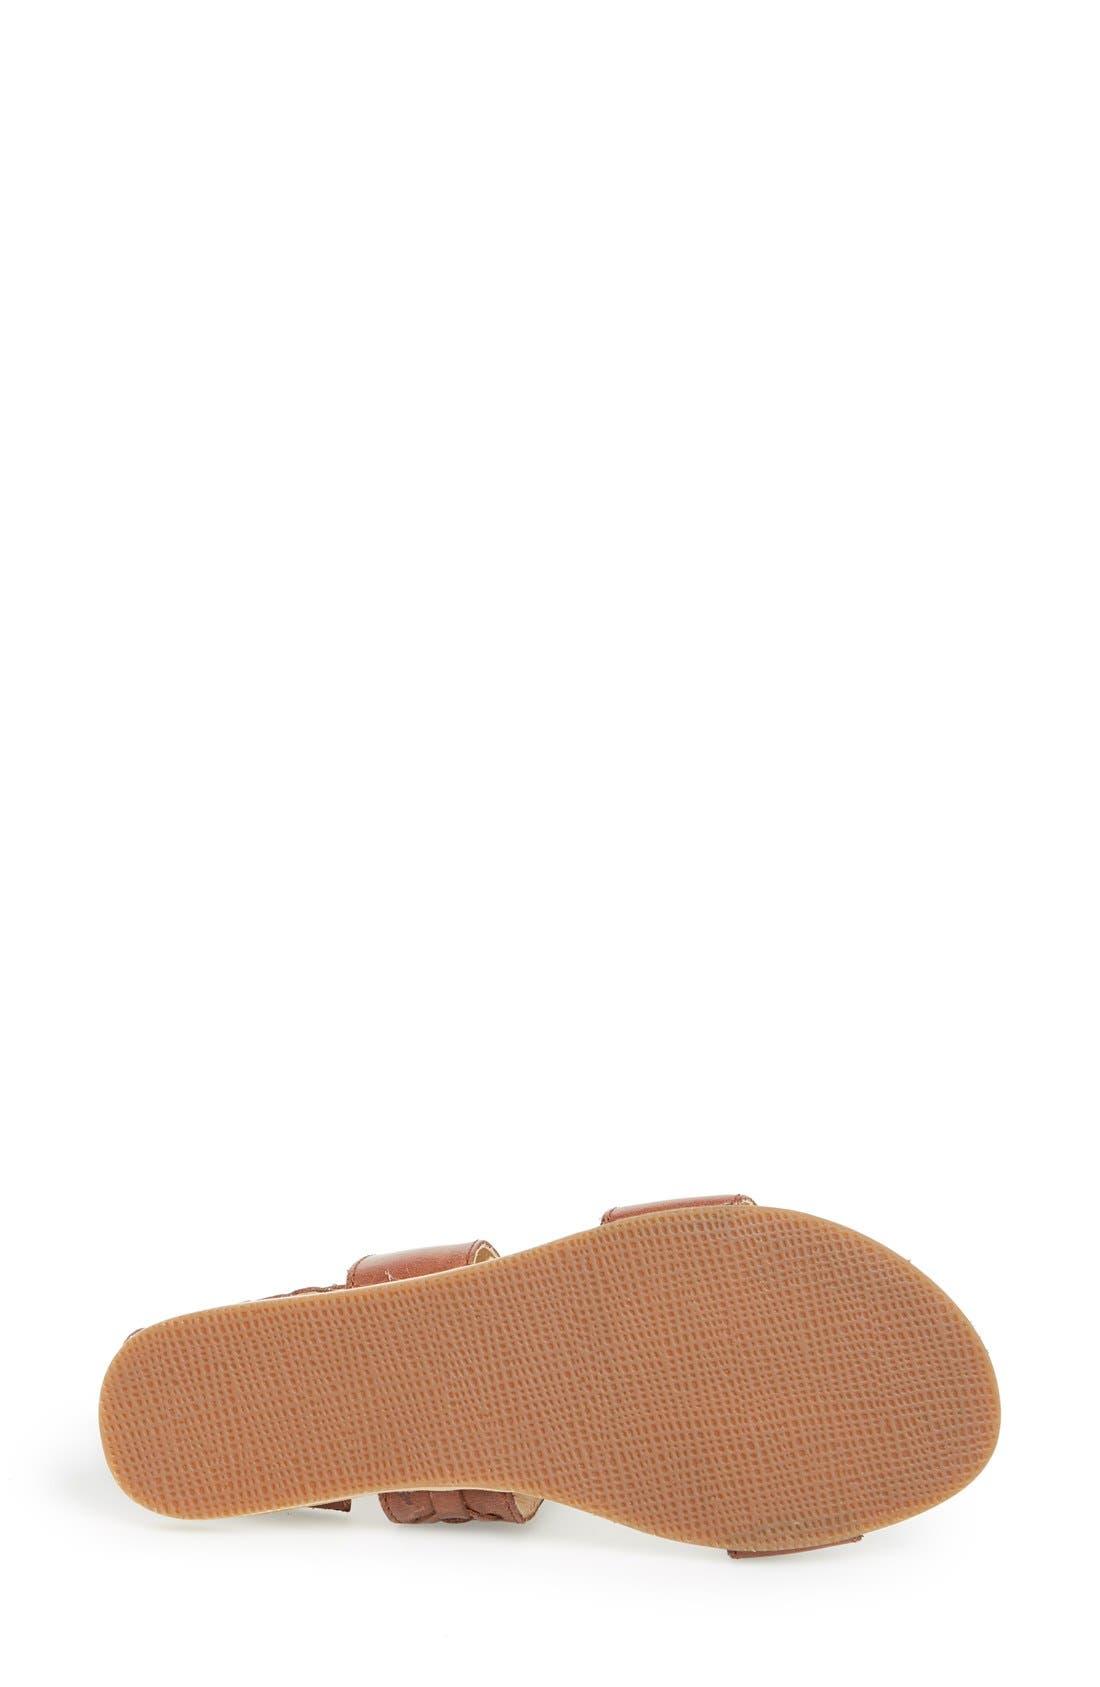 Alternate Image 4  - Koolaburra 'Alexa' Leather Ankle Strap Sandal (Women)